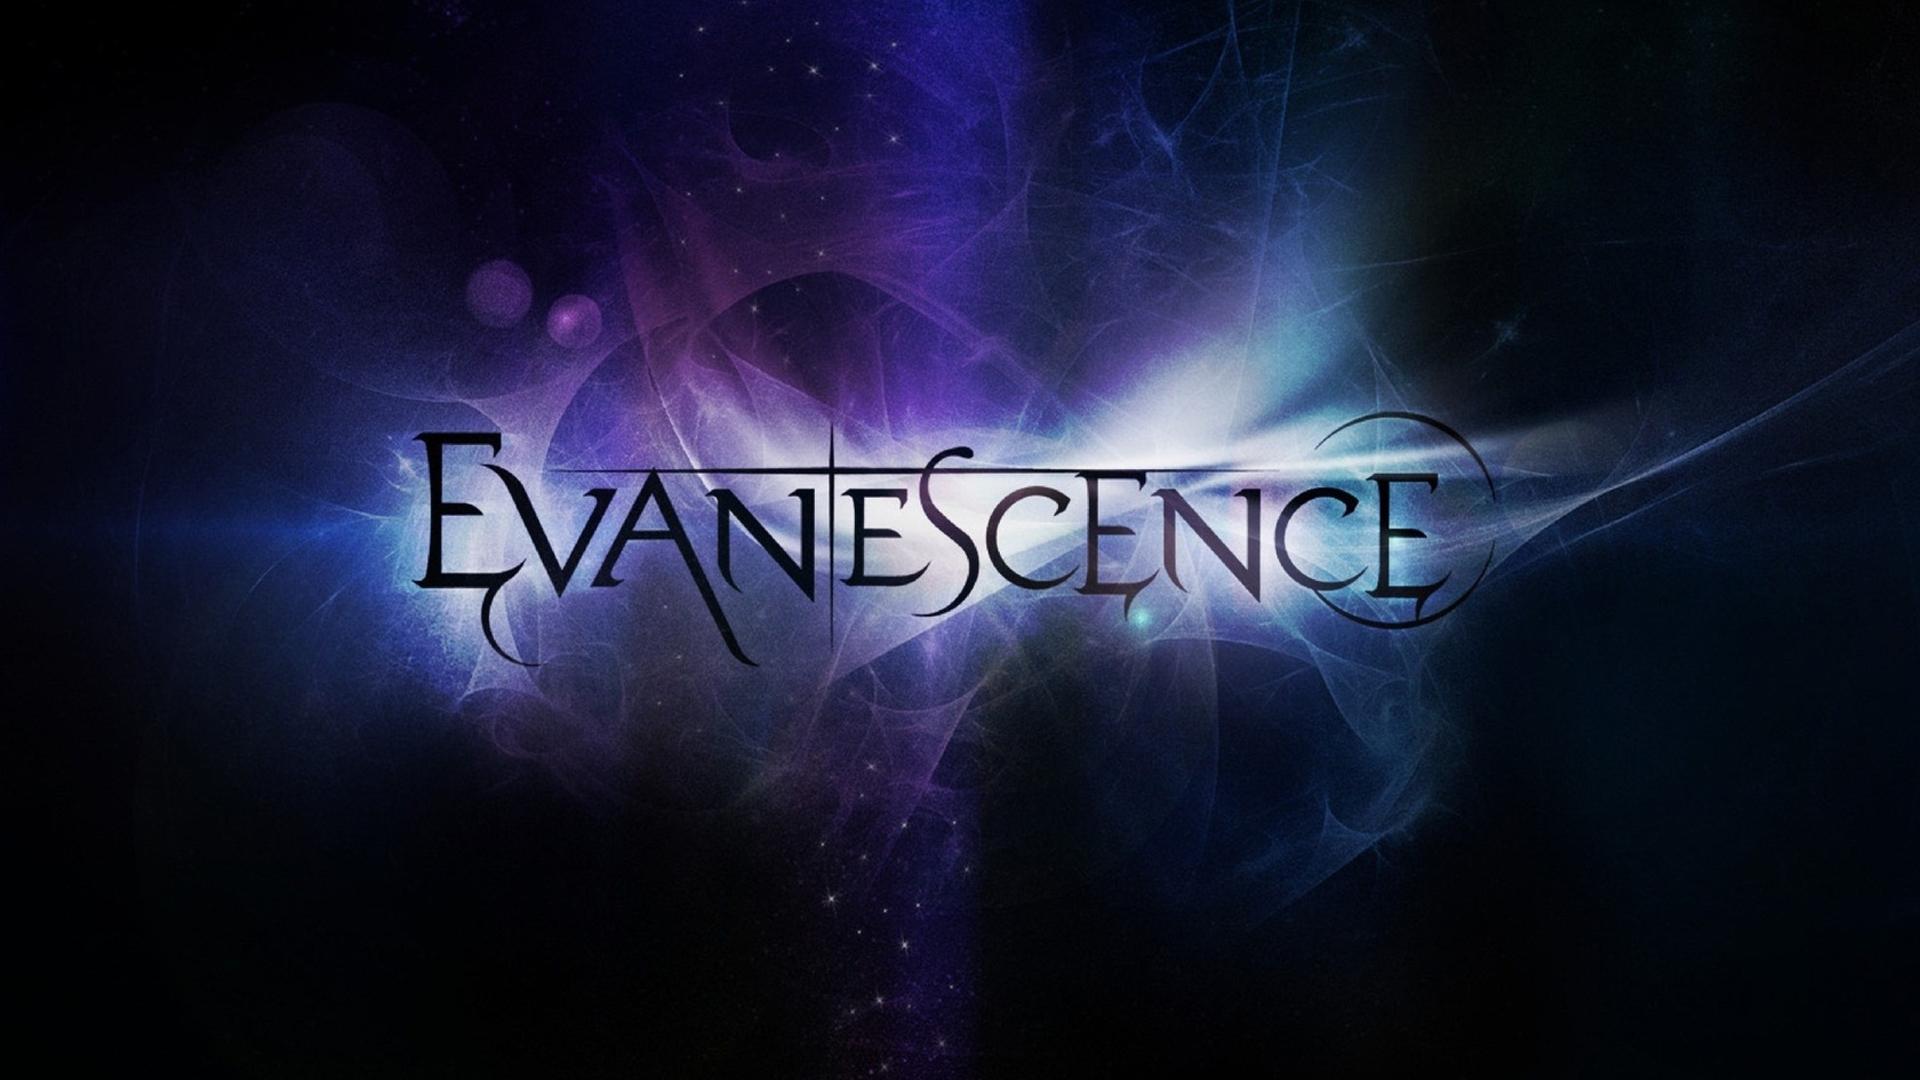 Evanescence For Desktop